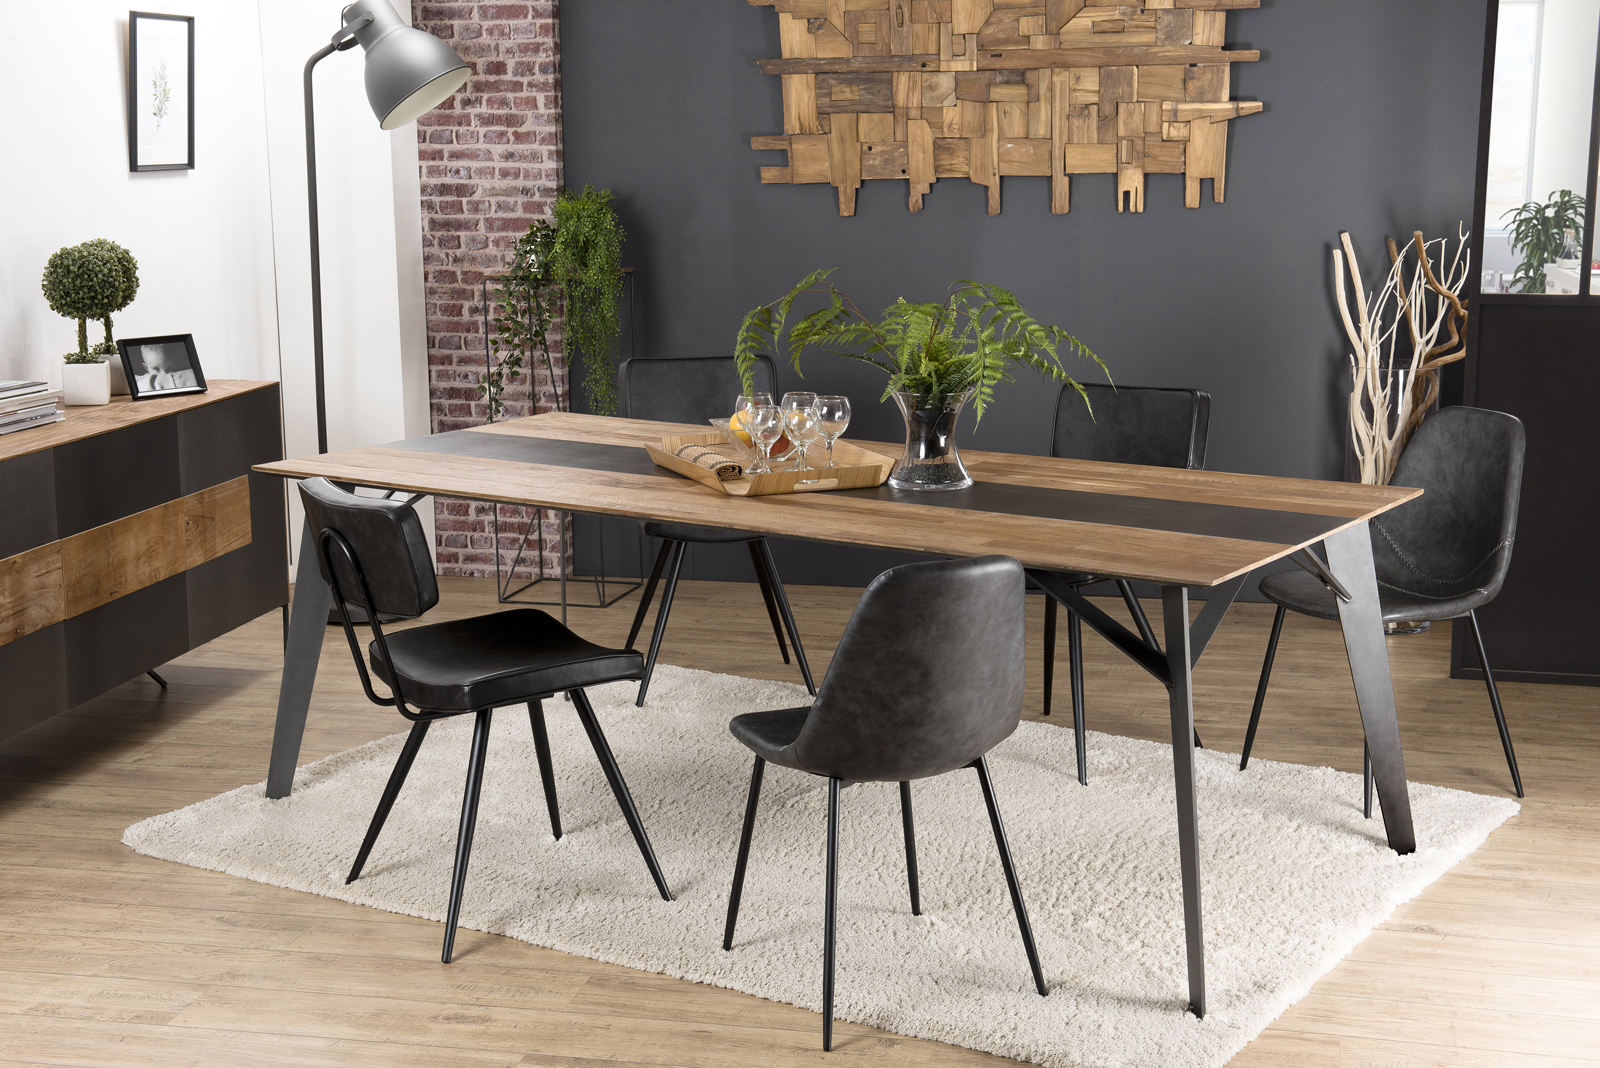 table industrielle a manger